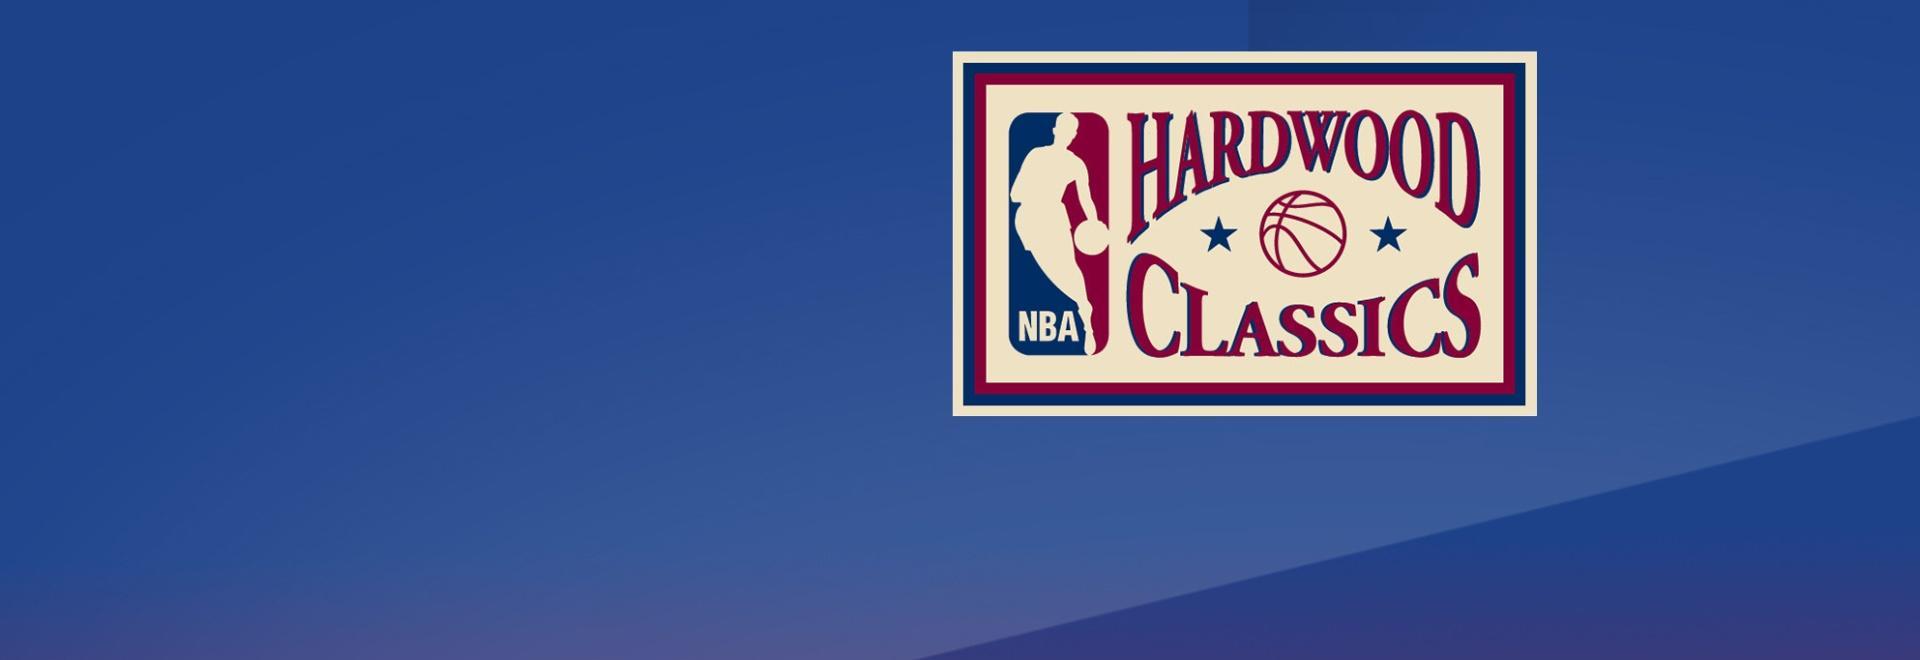 Sixers - Cavaliers 01/04/97 Allen Iverson: 50 pts